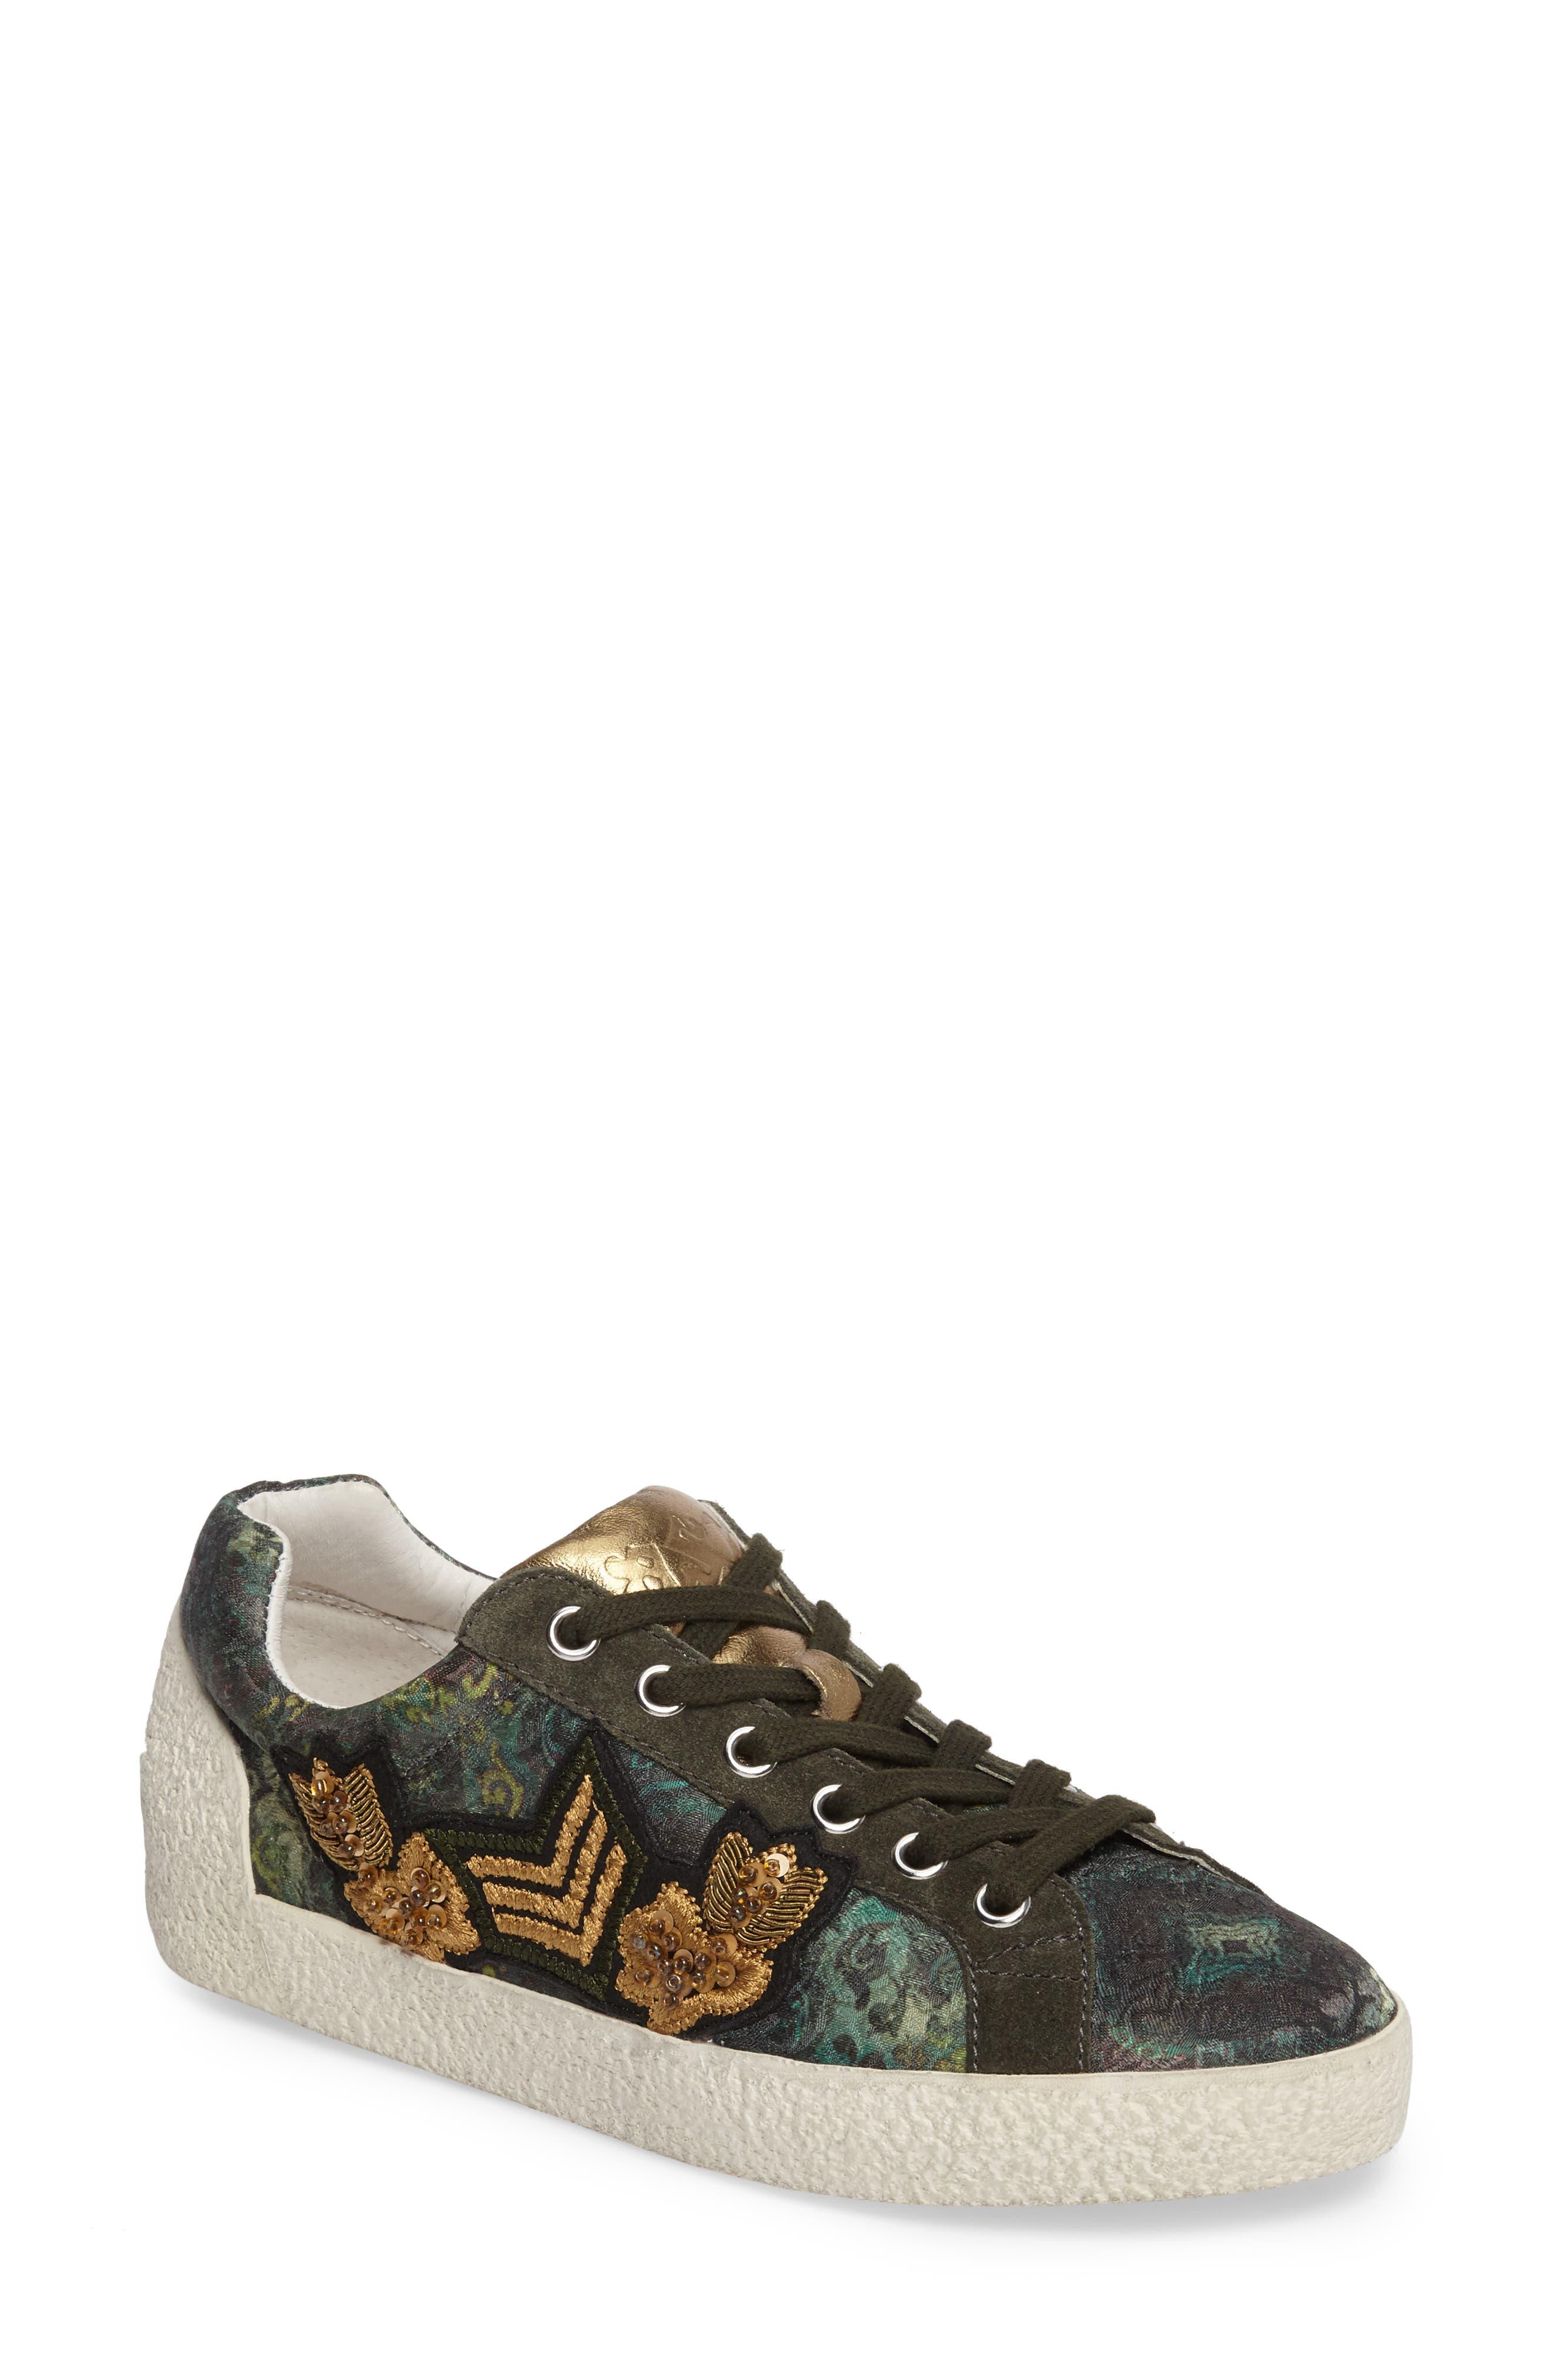 Main Image - Ash Embellished Low-Top Sneaker (Women)